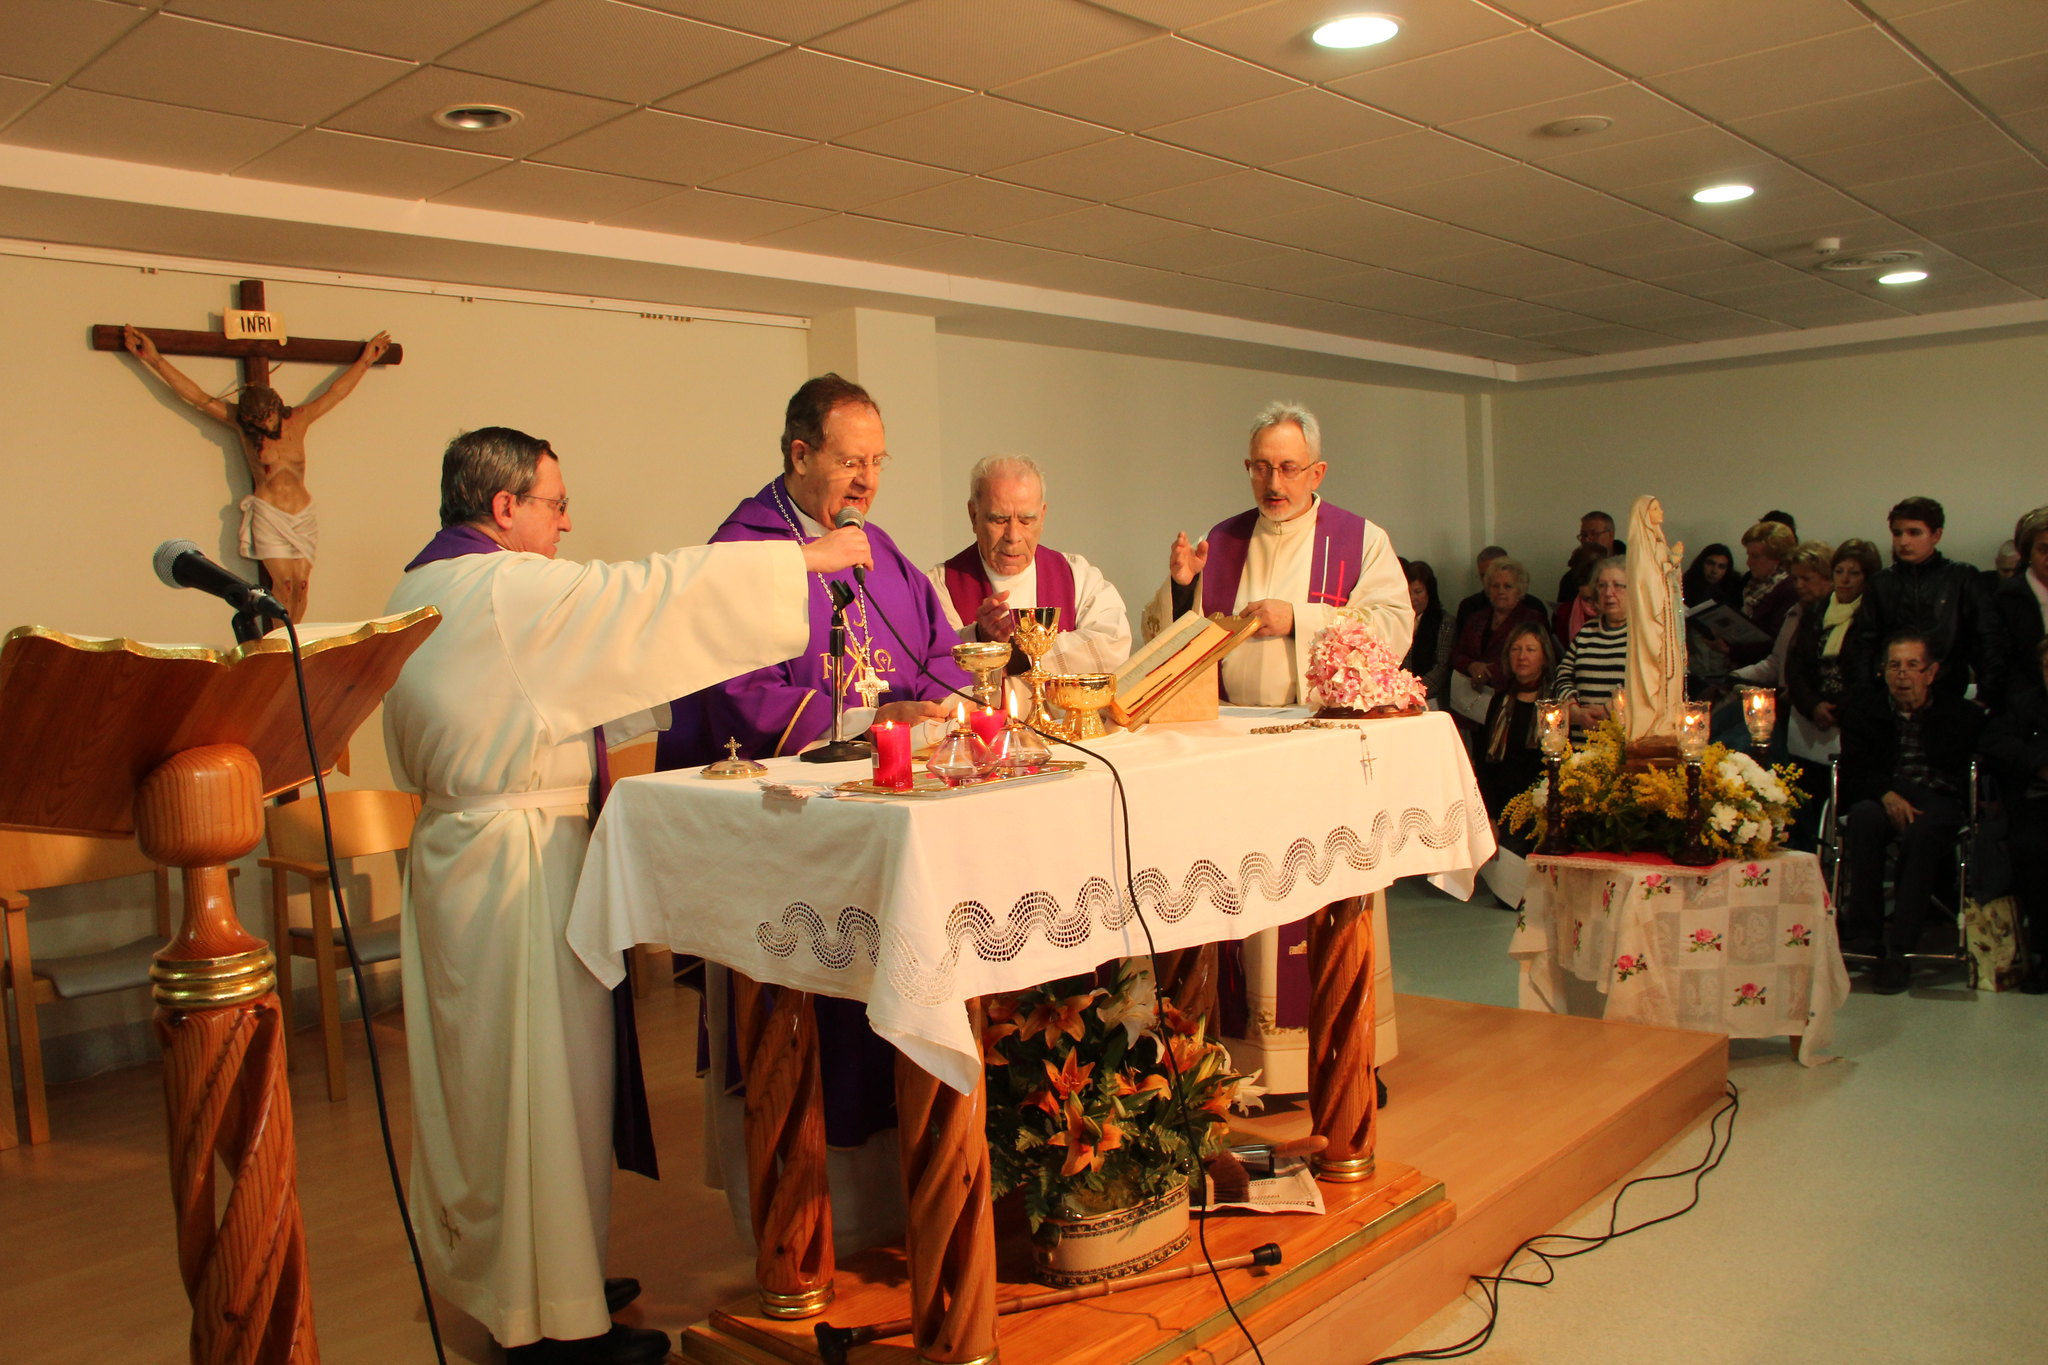 (2016-02-13) - Inauguración Virgen De Lourdes, La Molineta - Archivo La Molineta (047)